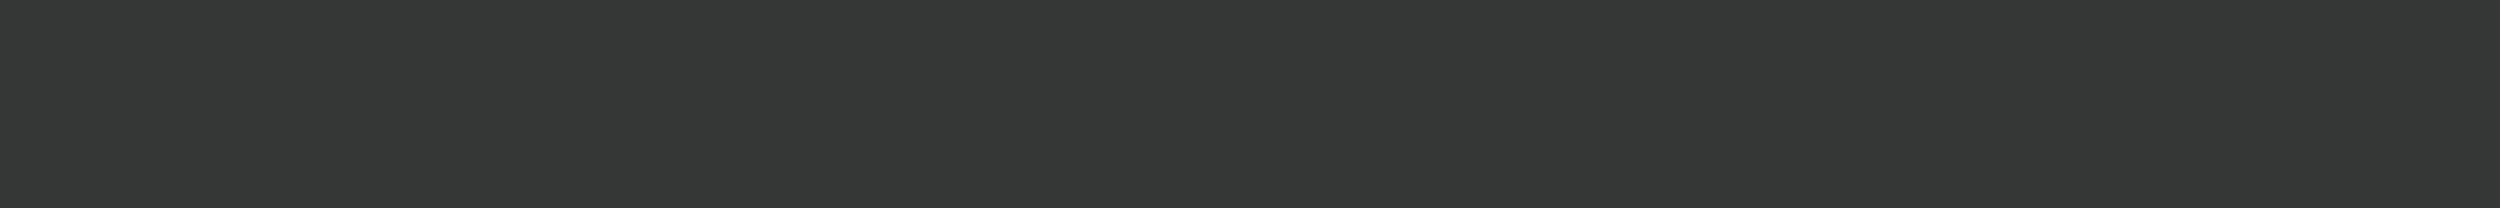 grey block.jpg